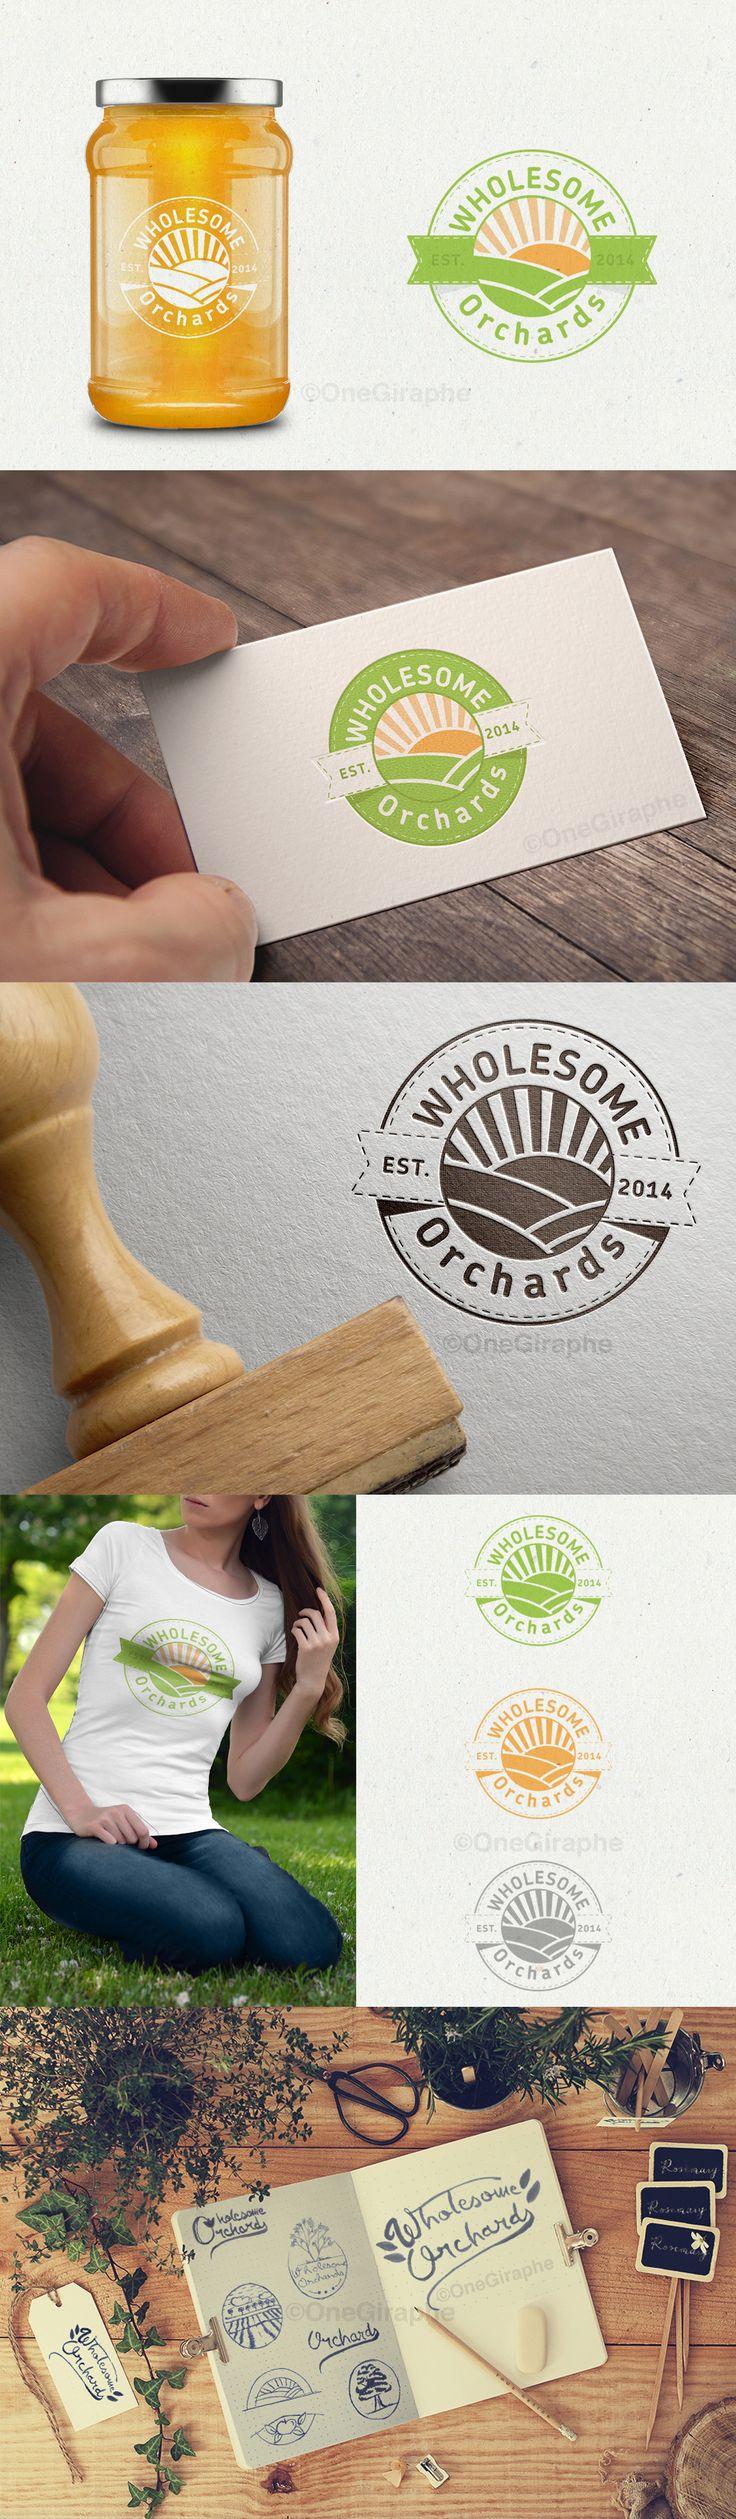 CREATING A LOGO...  #logodesign #creatingalogo